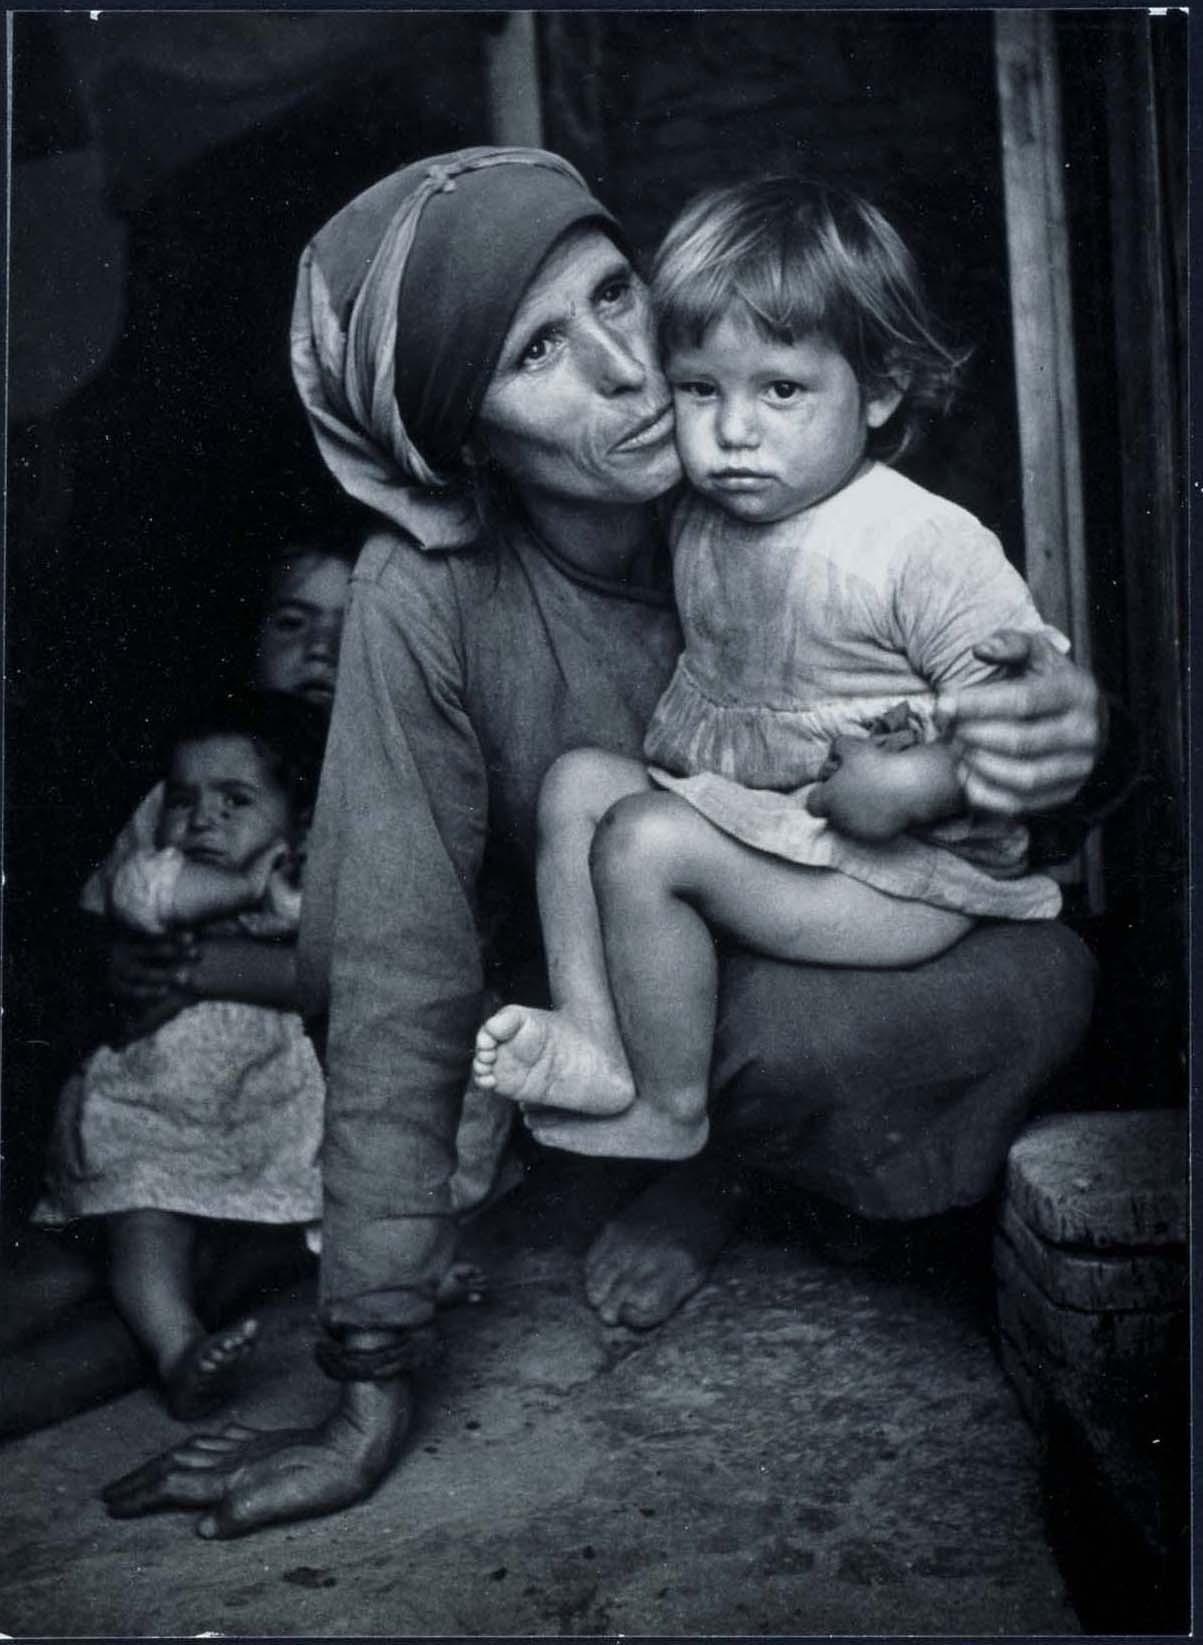 Mother and Child (Madre e hijo) William Eugene Smith Serie:  Spanish Village (Pueblo español) Fecha:  1950 / Copia posterior Reina Sofía.